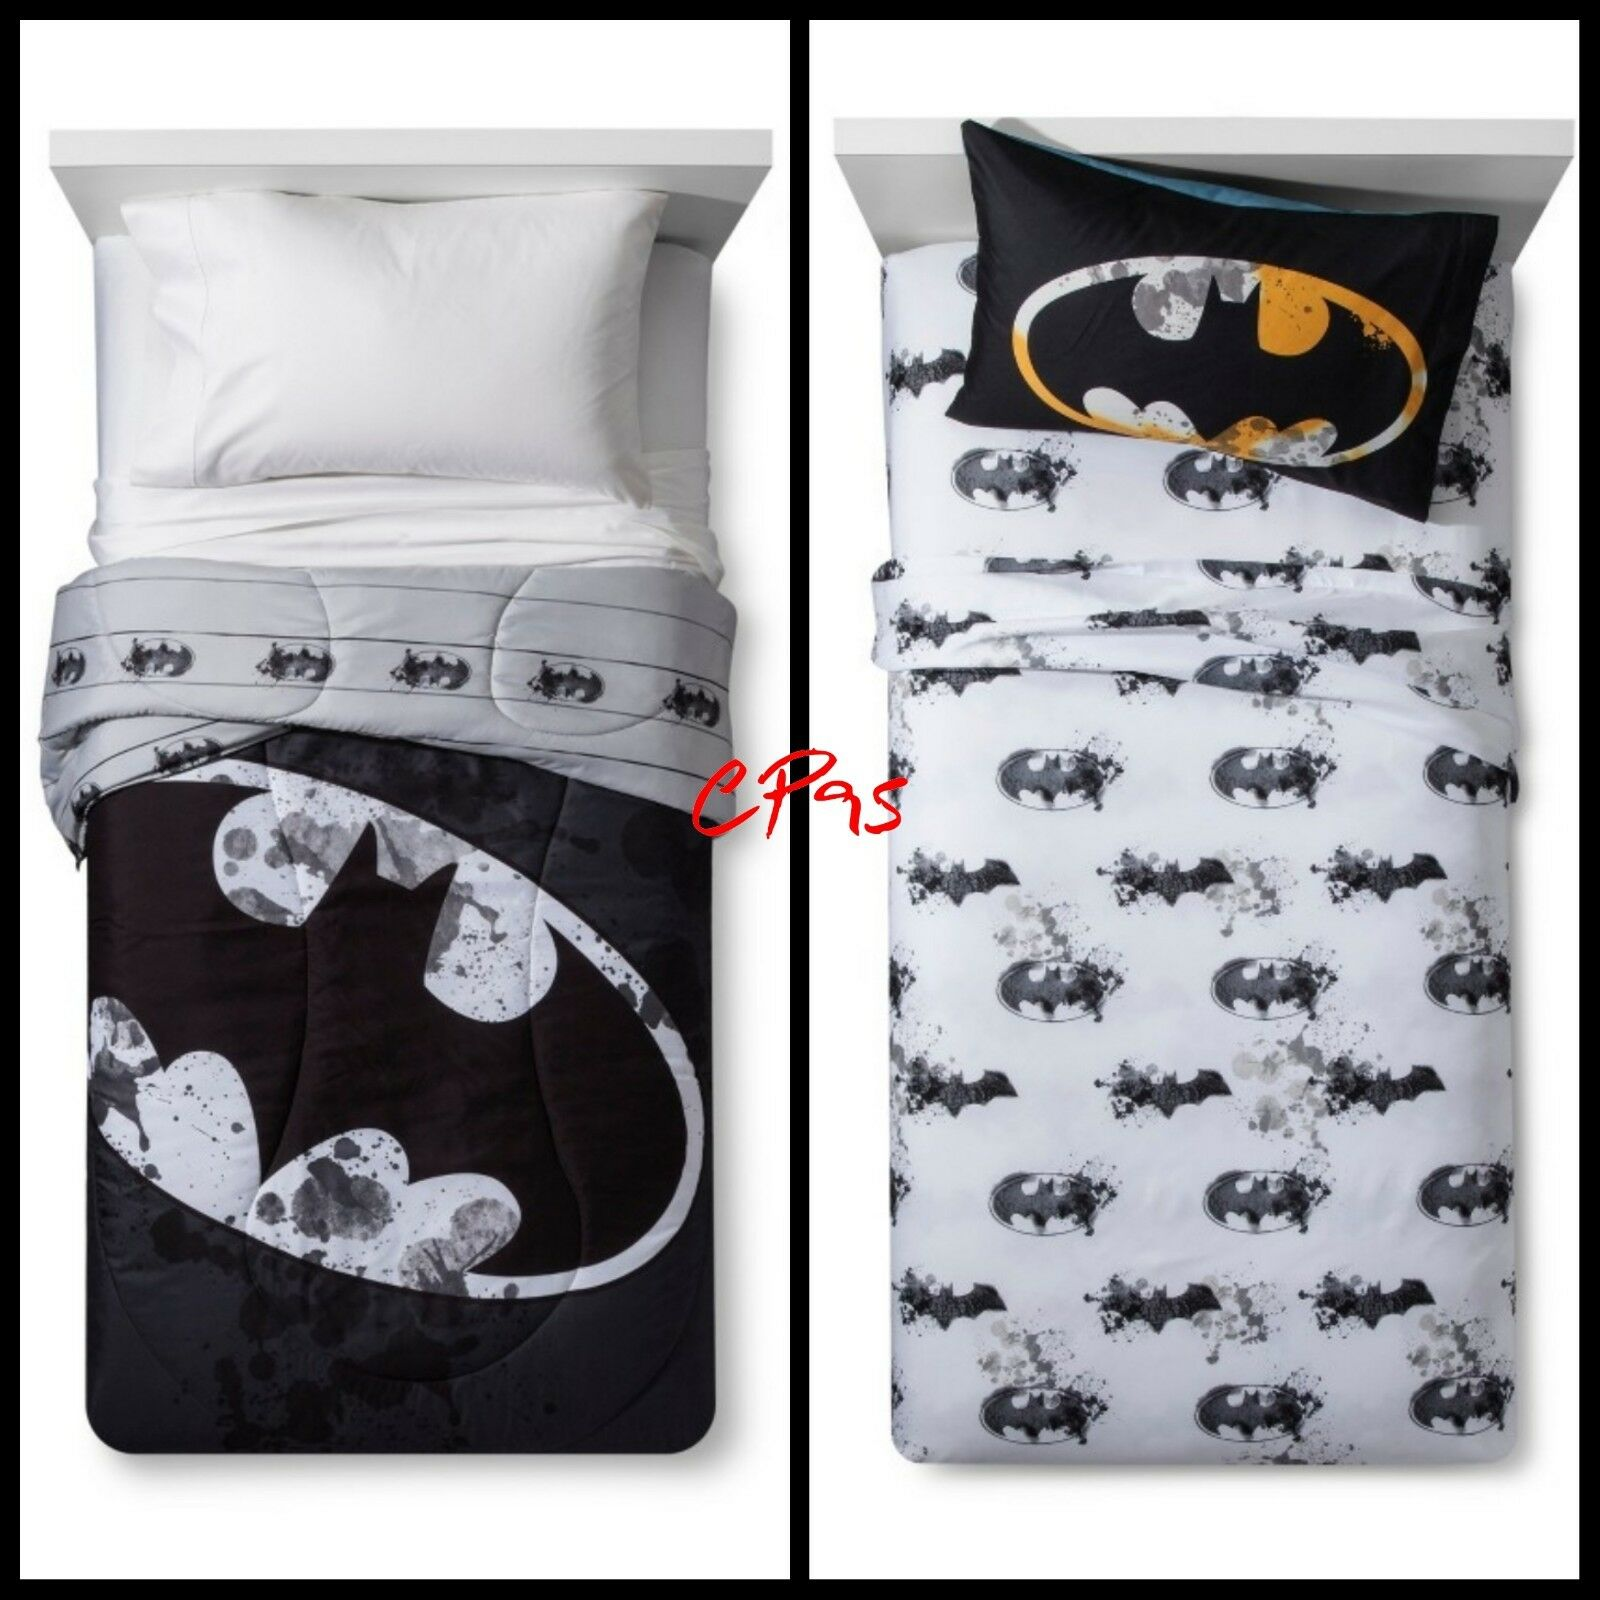 DC BATMAN TWIN BEDDING Reversible Comforter w  3Pc Twin Sheet Set  BED IN A BAG